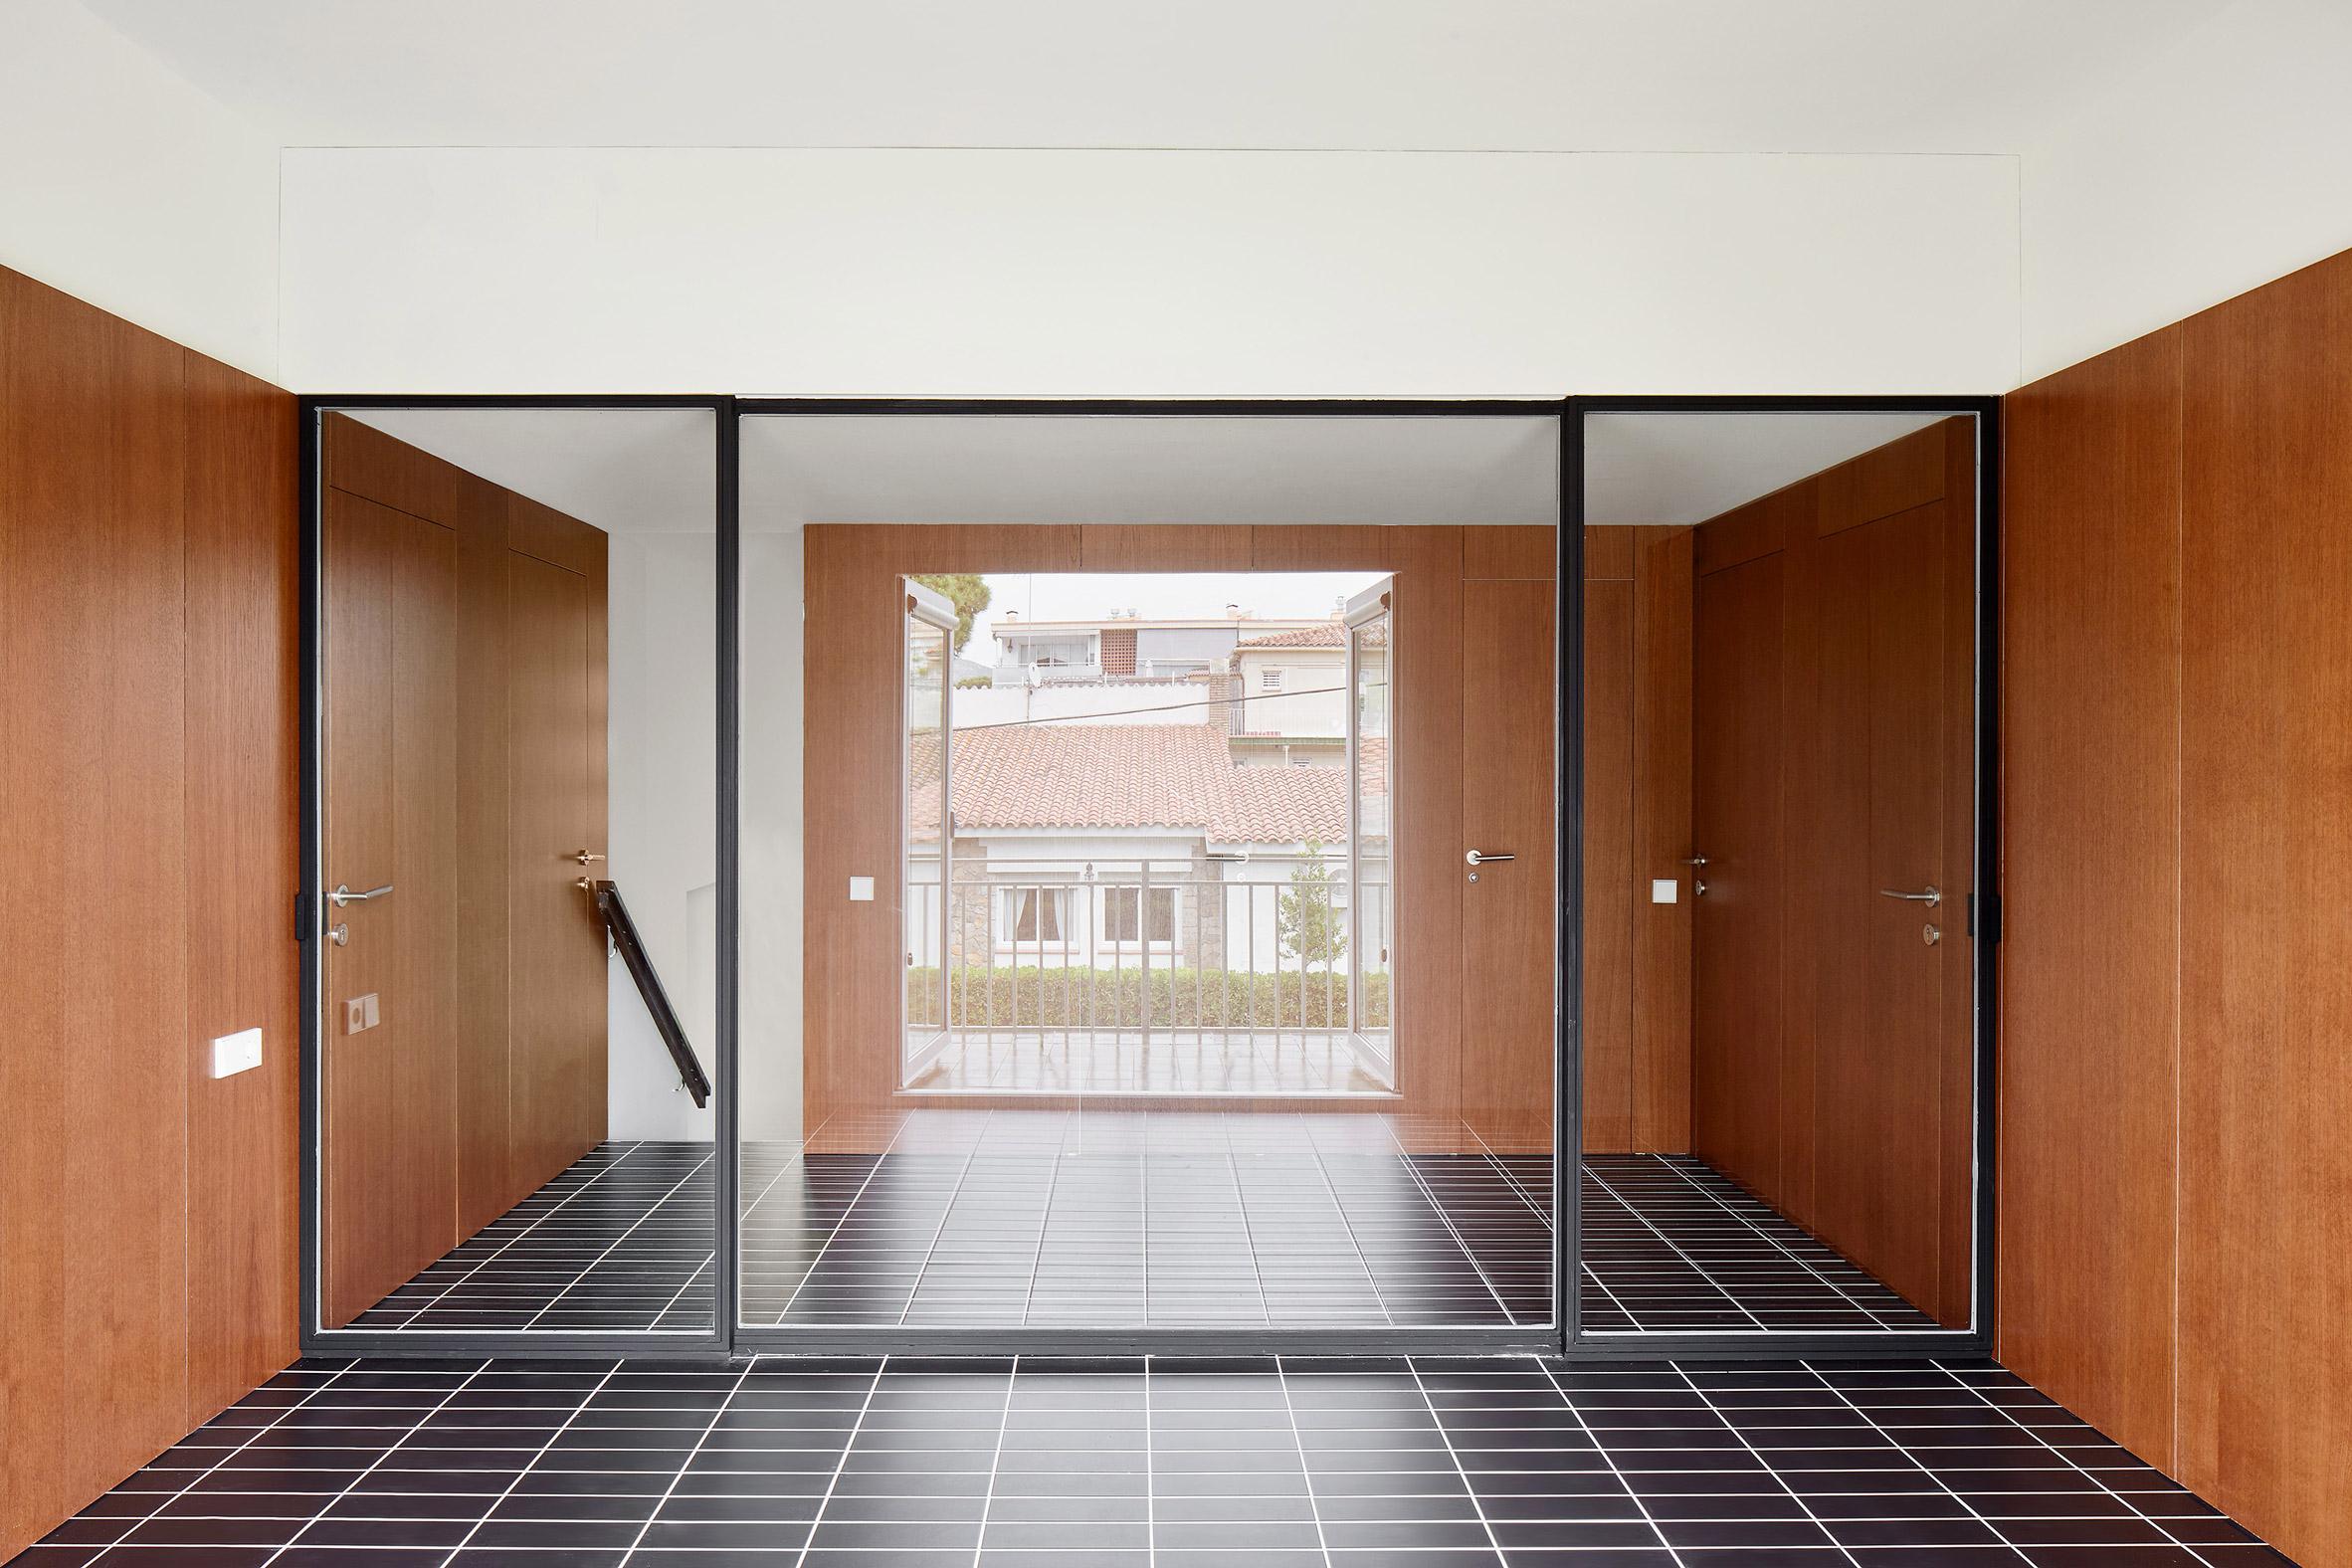 house-106-raul-sanchez-interiors_dezeen_2364_col_10